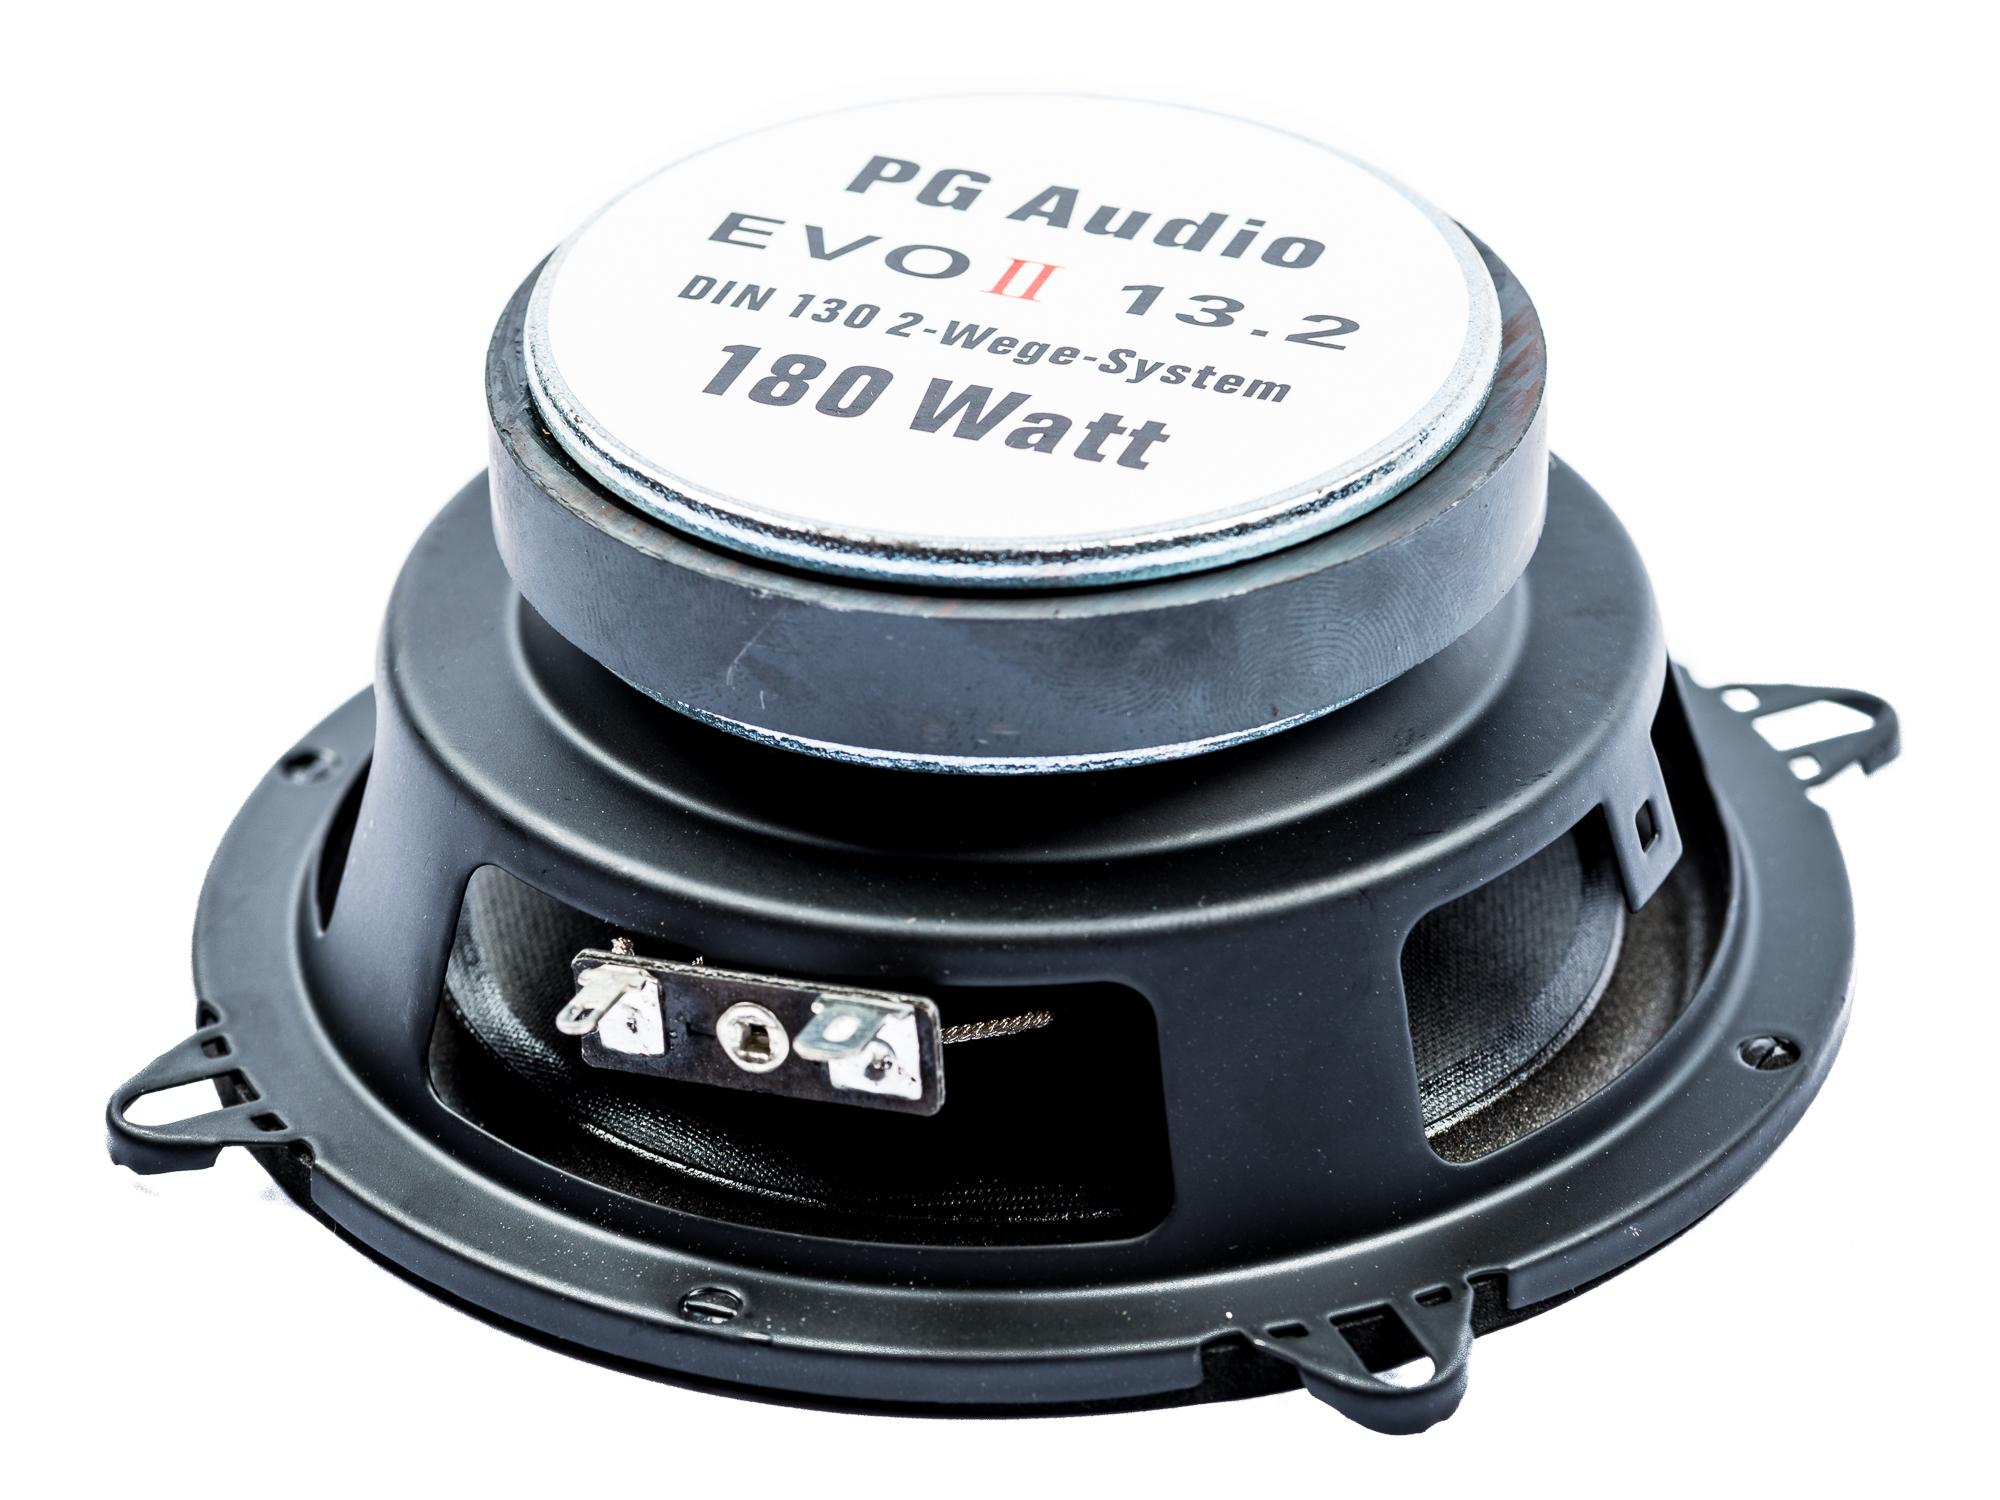 PG Audio EVO II, 13 cm Coaxial Auto Lautsprecher 13.2 , B-Ware – Bild 3